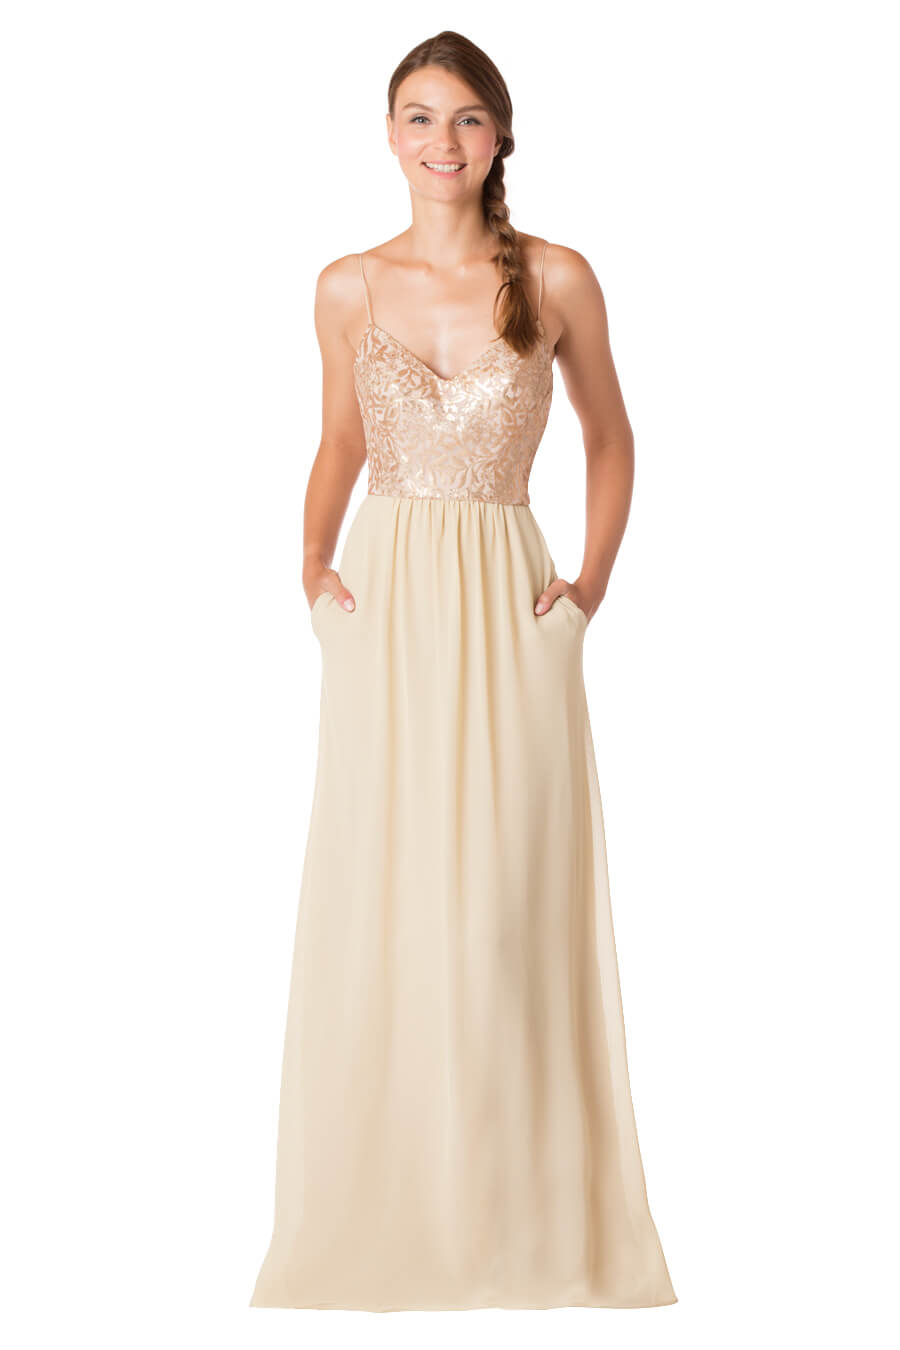 Bari jay bridesmaids bridesmaid dresses prom dresses formal bari jay 810 ombrellifo Images